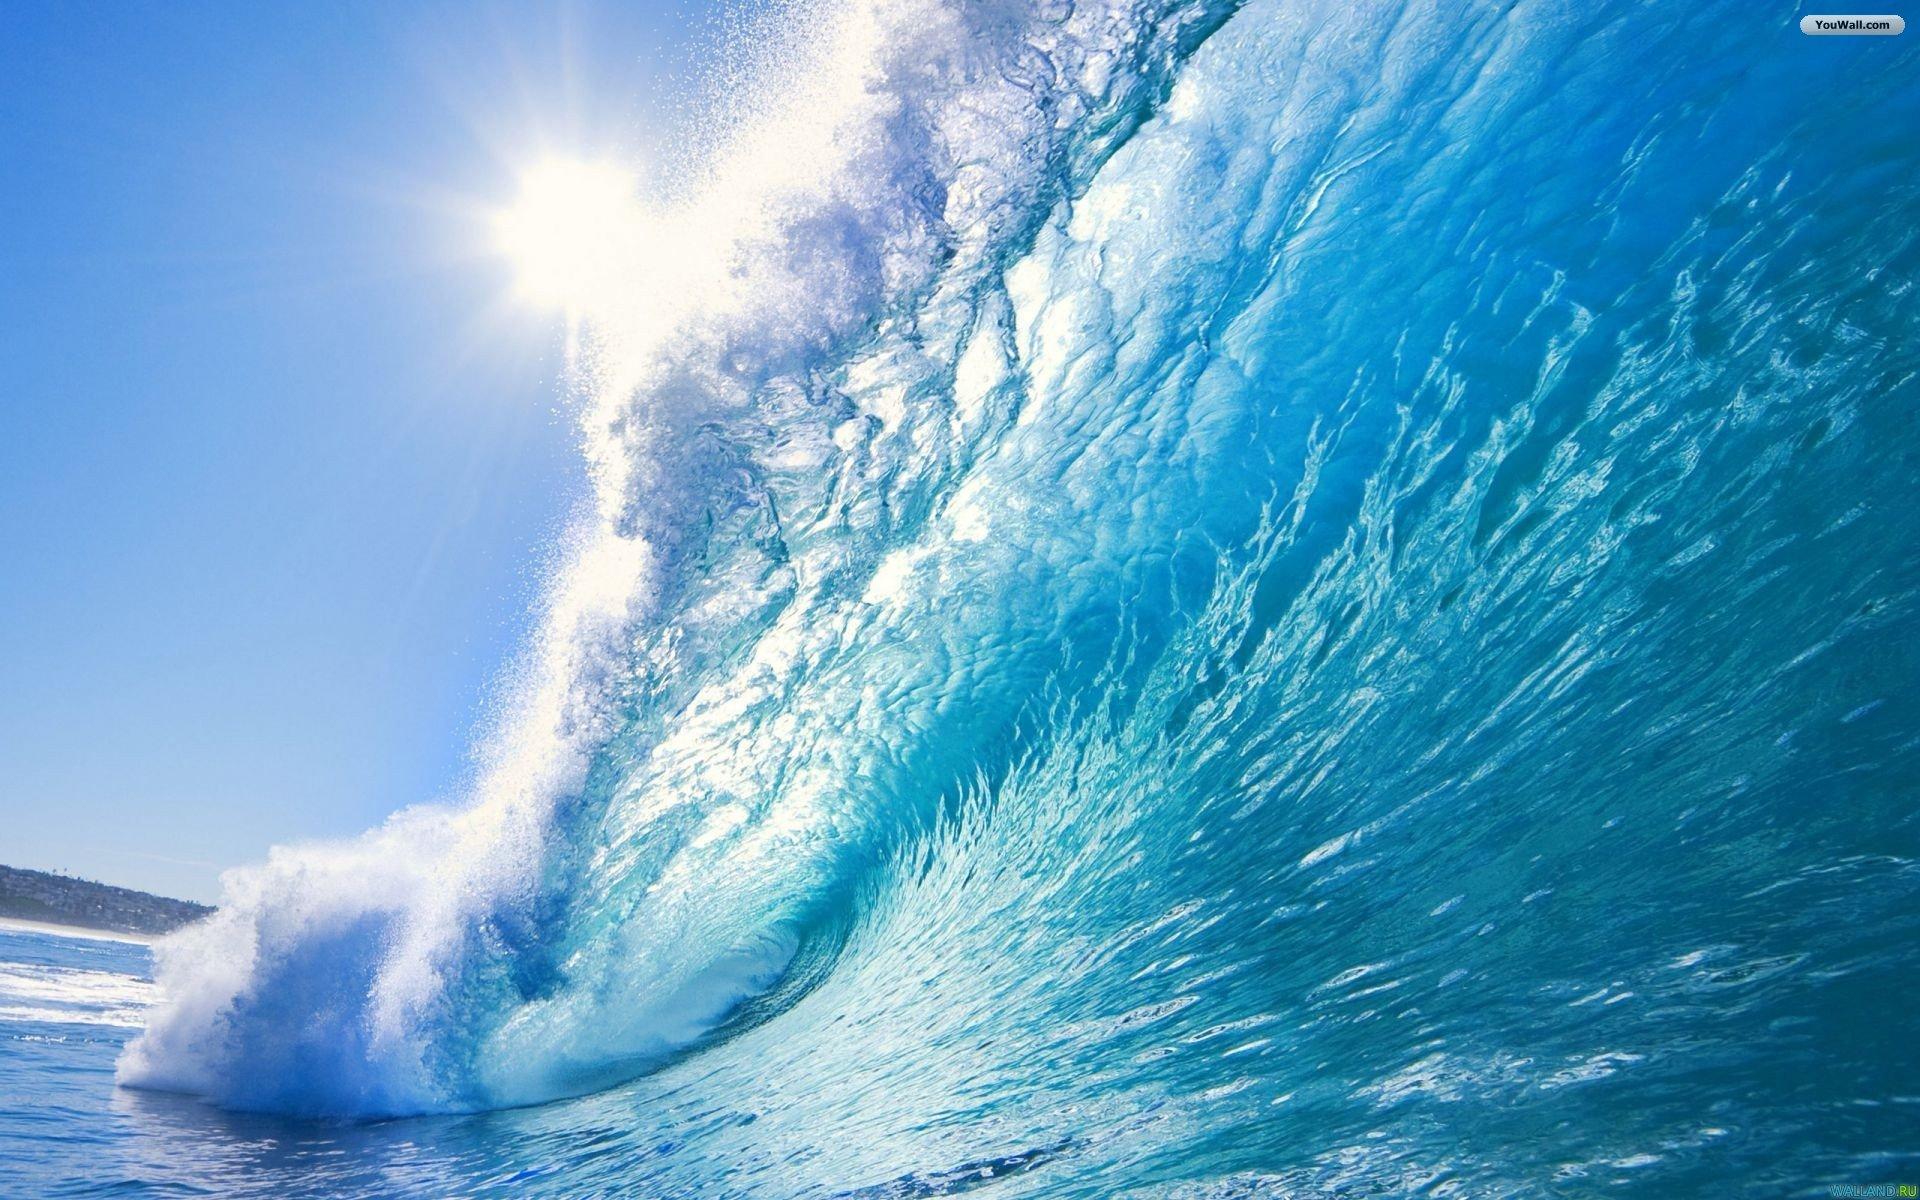 Ocean Waves Beach Wallpaper Ocean Wave Wallpaper 1920x1200